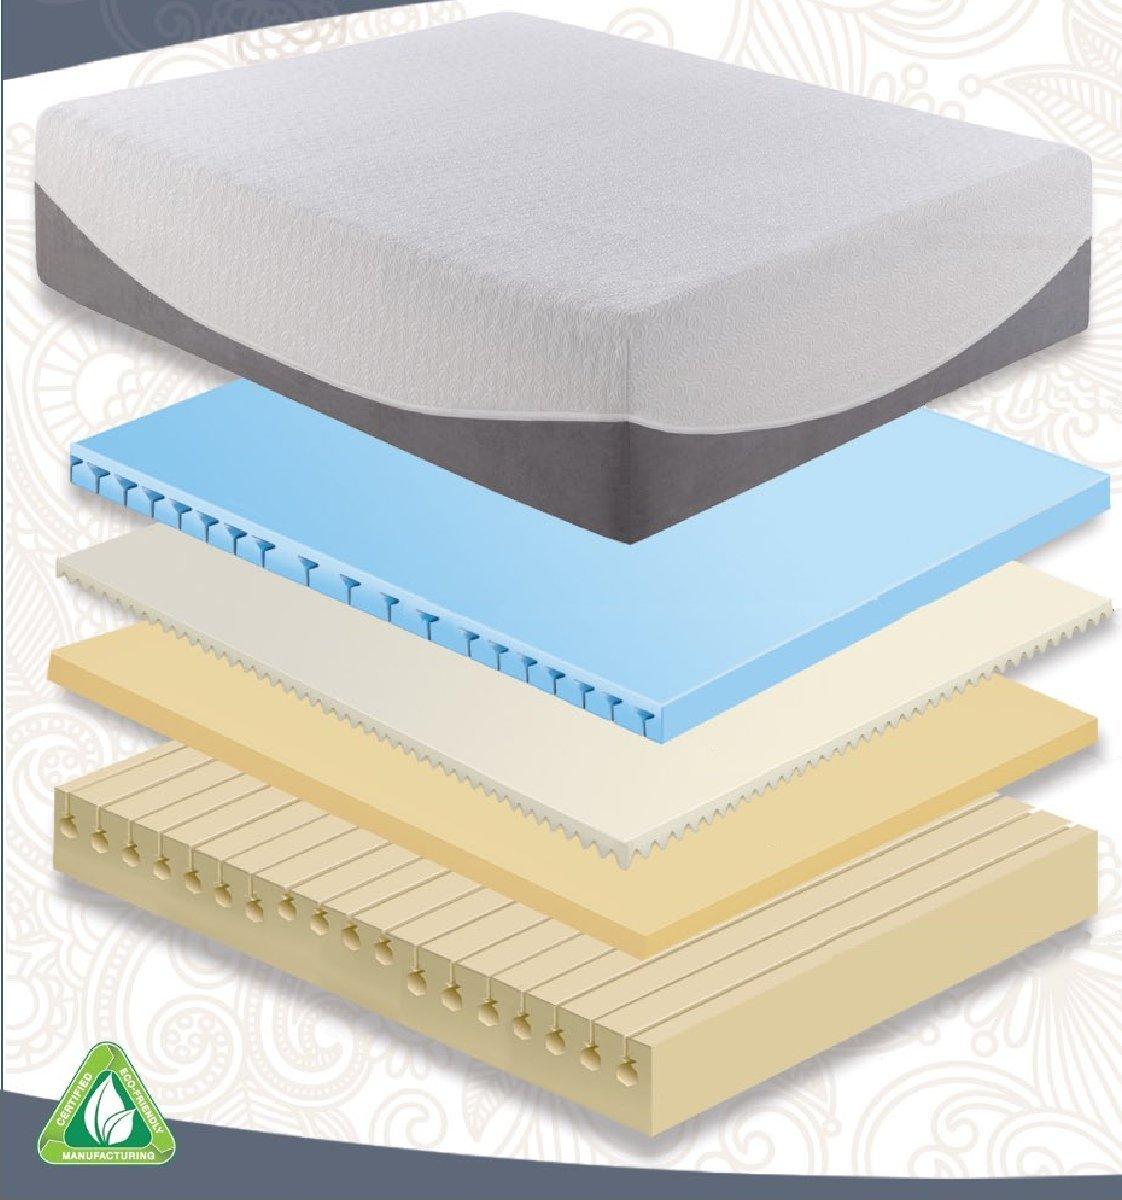 Comfort Gel 12 inch Gel-Infused Memory Foam Mattress size Cal King